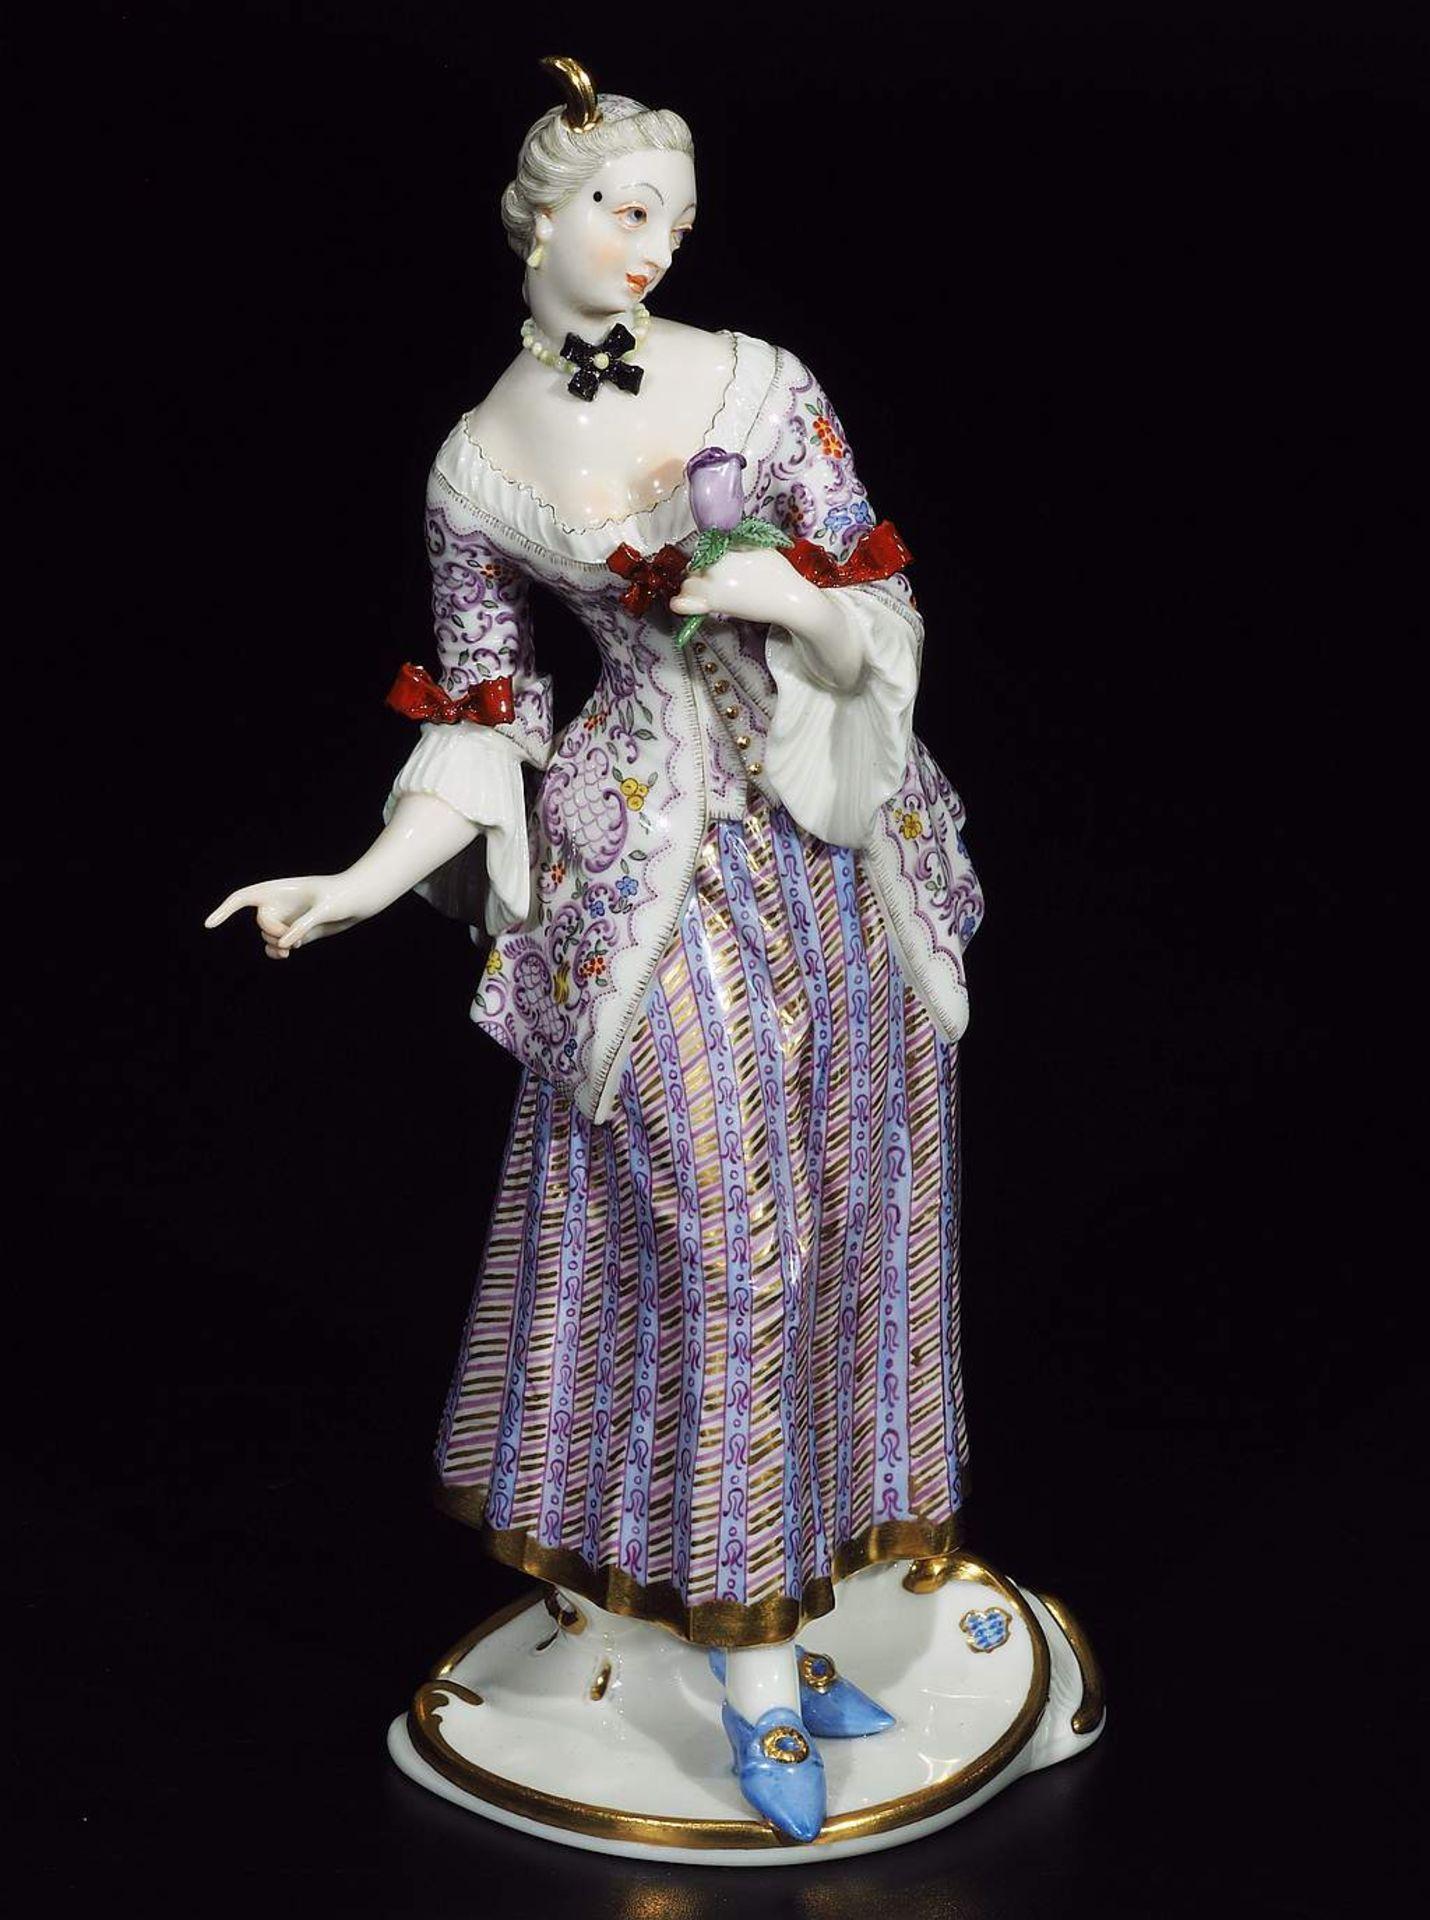 LUCINDA, Figurine der Commedia dell'Arte, NYMPHENBURG, Jahrhundert. - Image 2 of 8